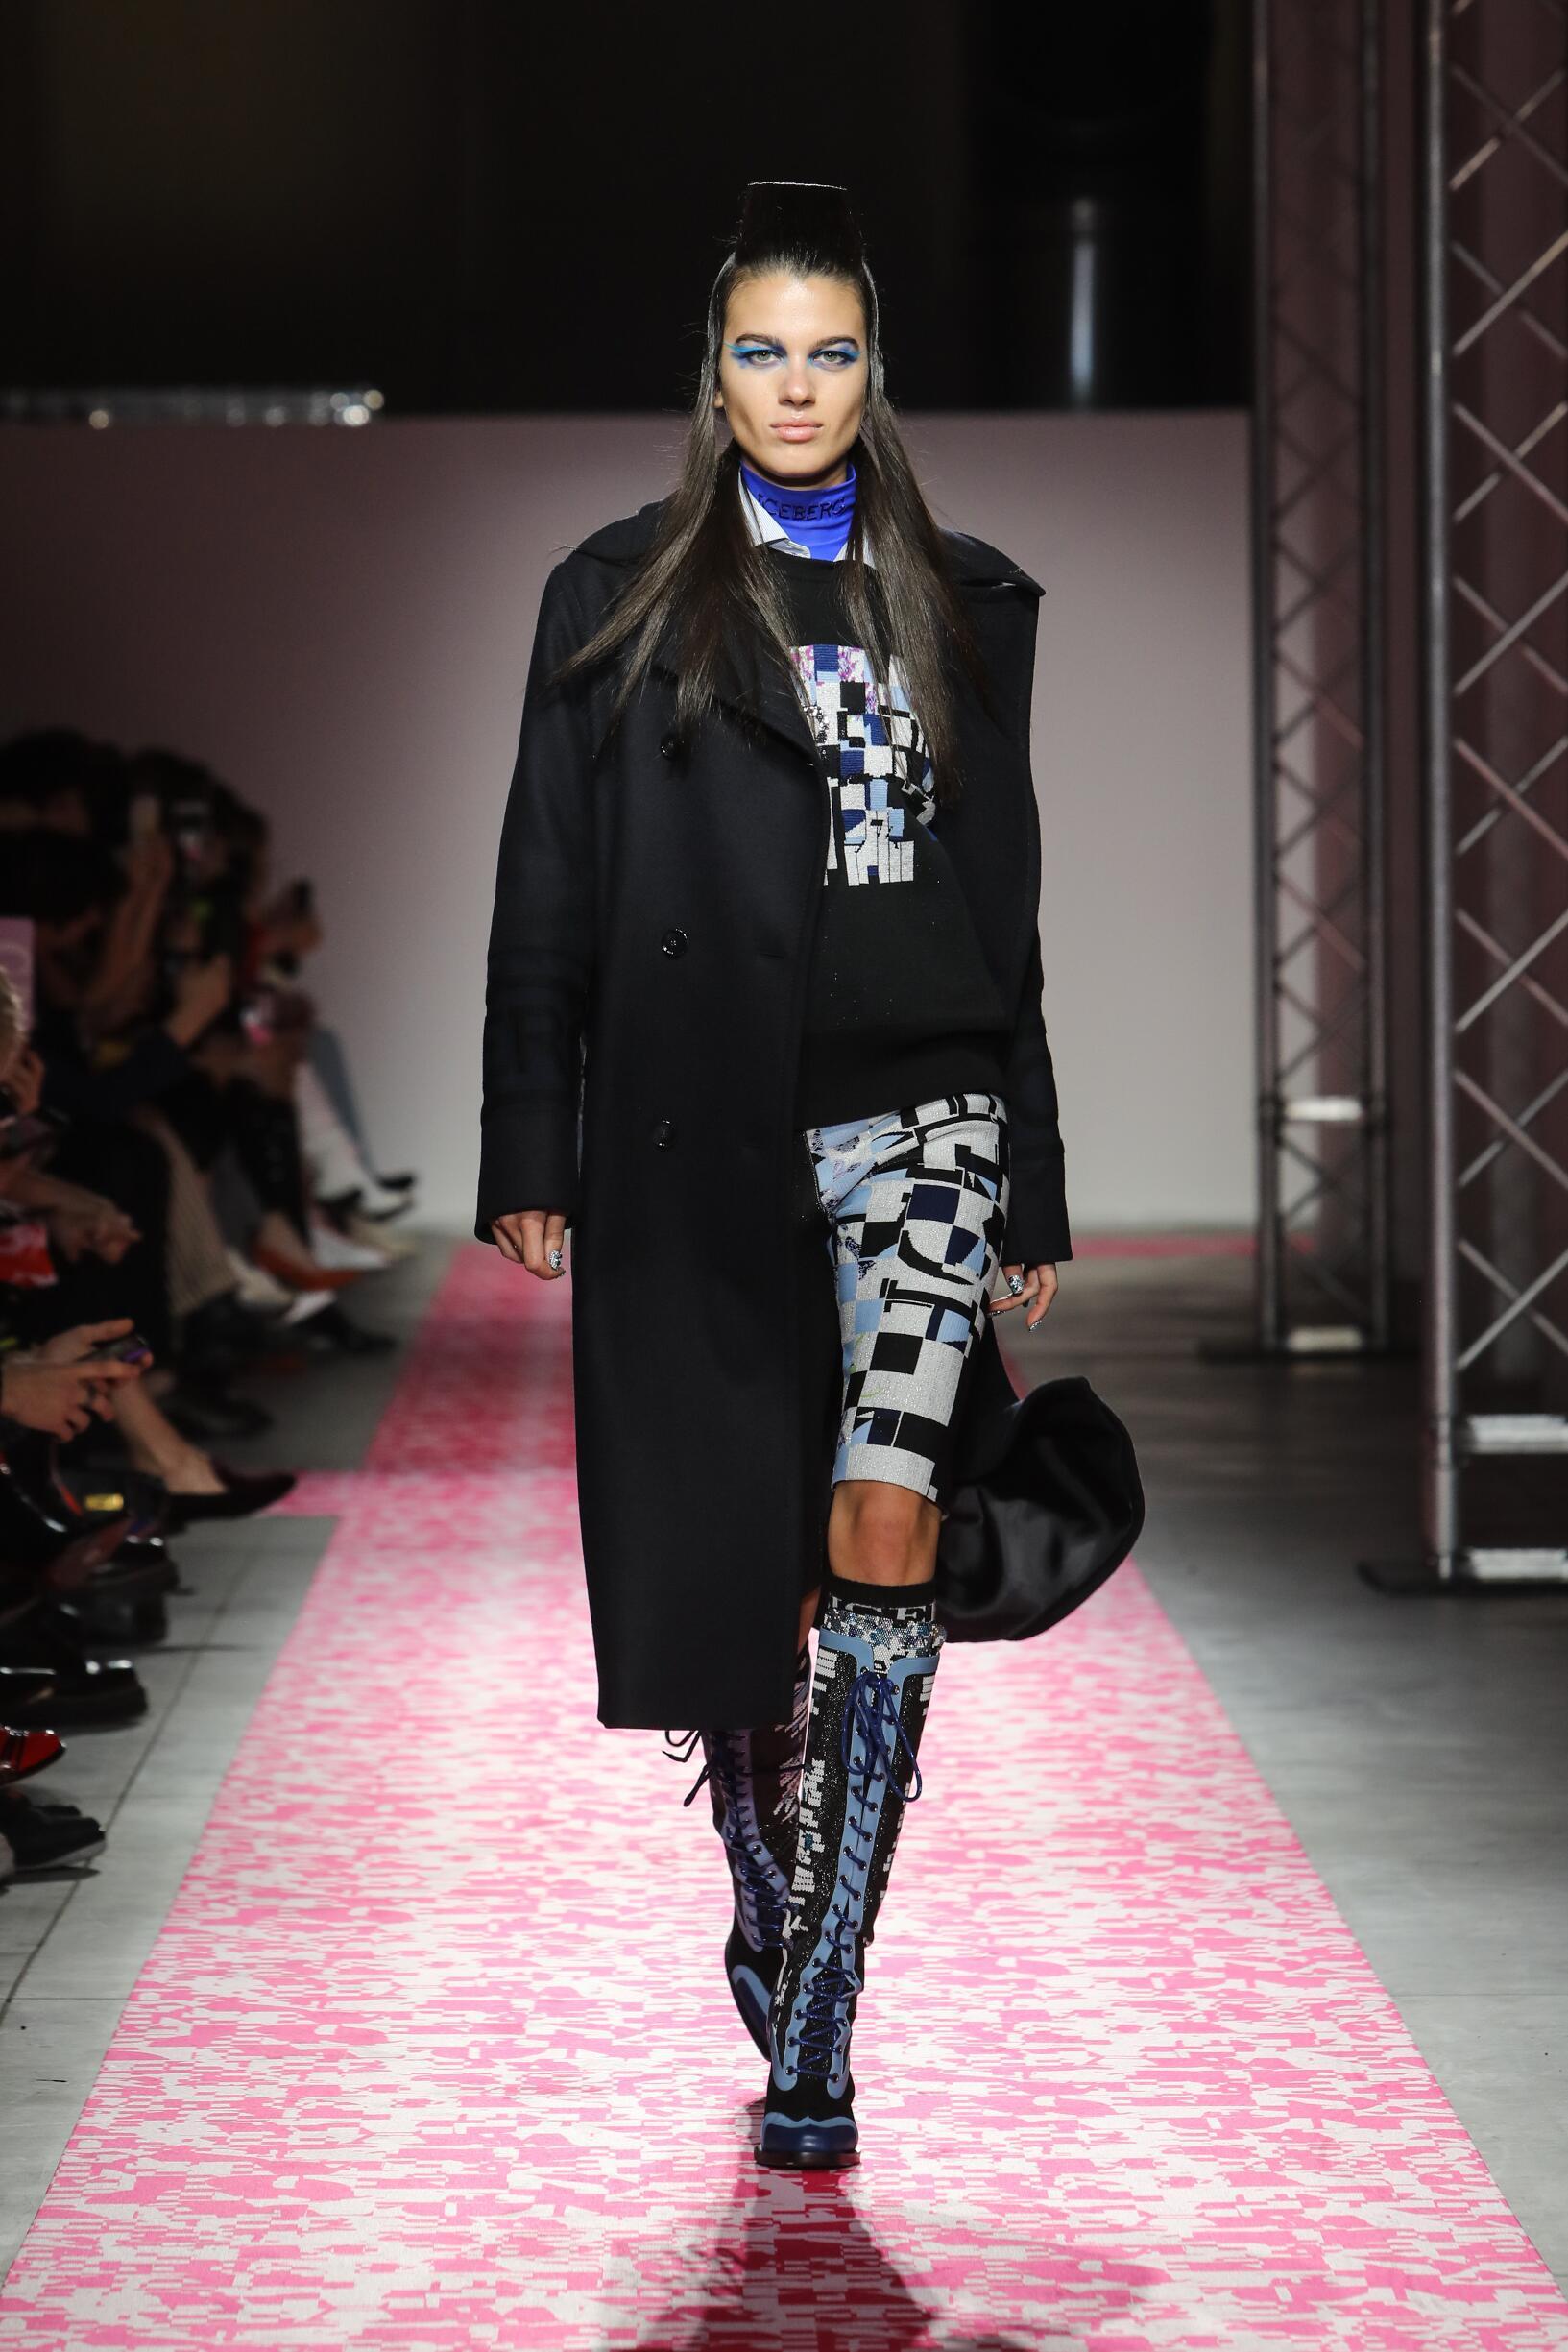 FW 2019-20 Fashion Show Iceberg